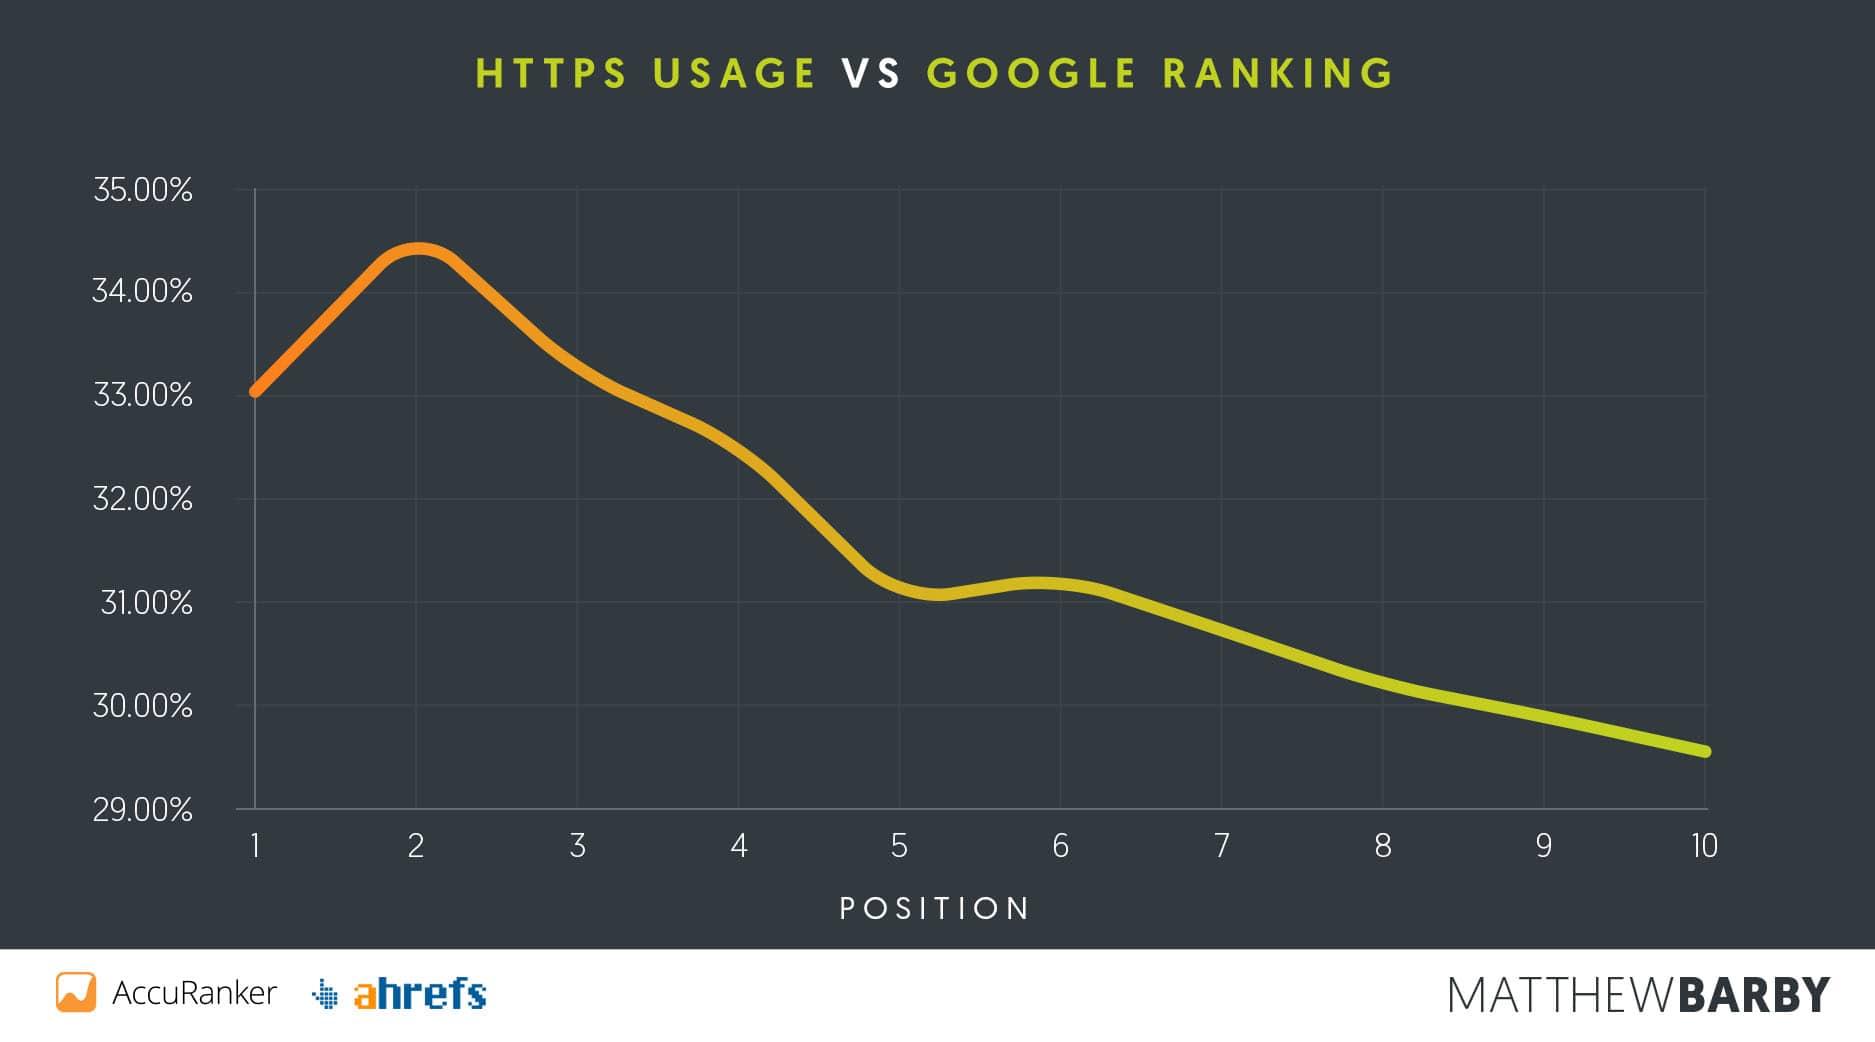 Utilisation du HTTPS vs. classement Google